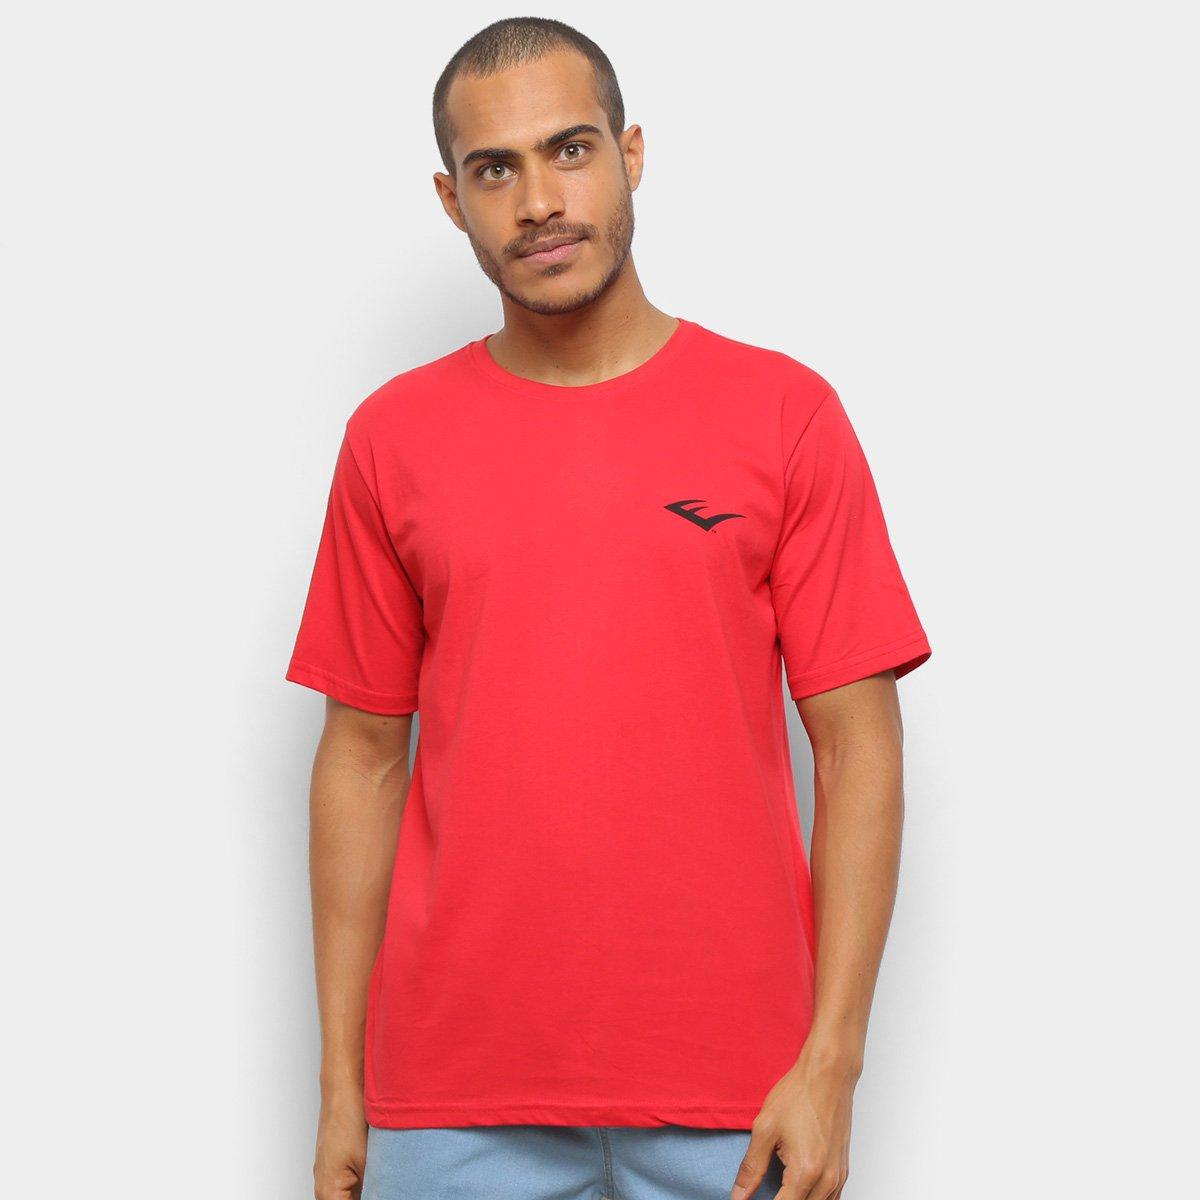 Camiseta Everlast Greatness Masculina